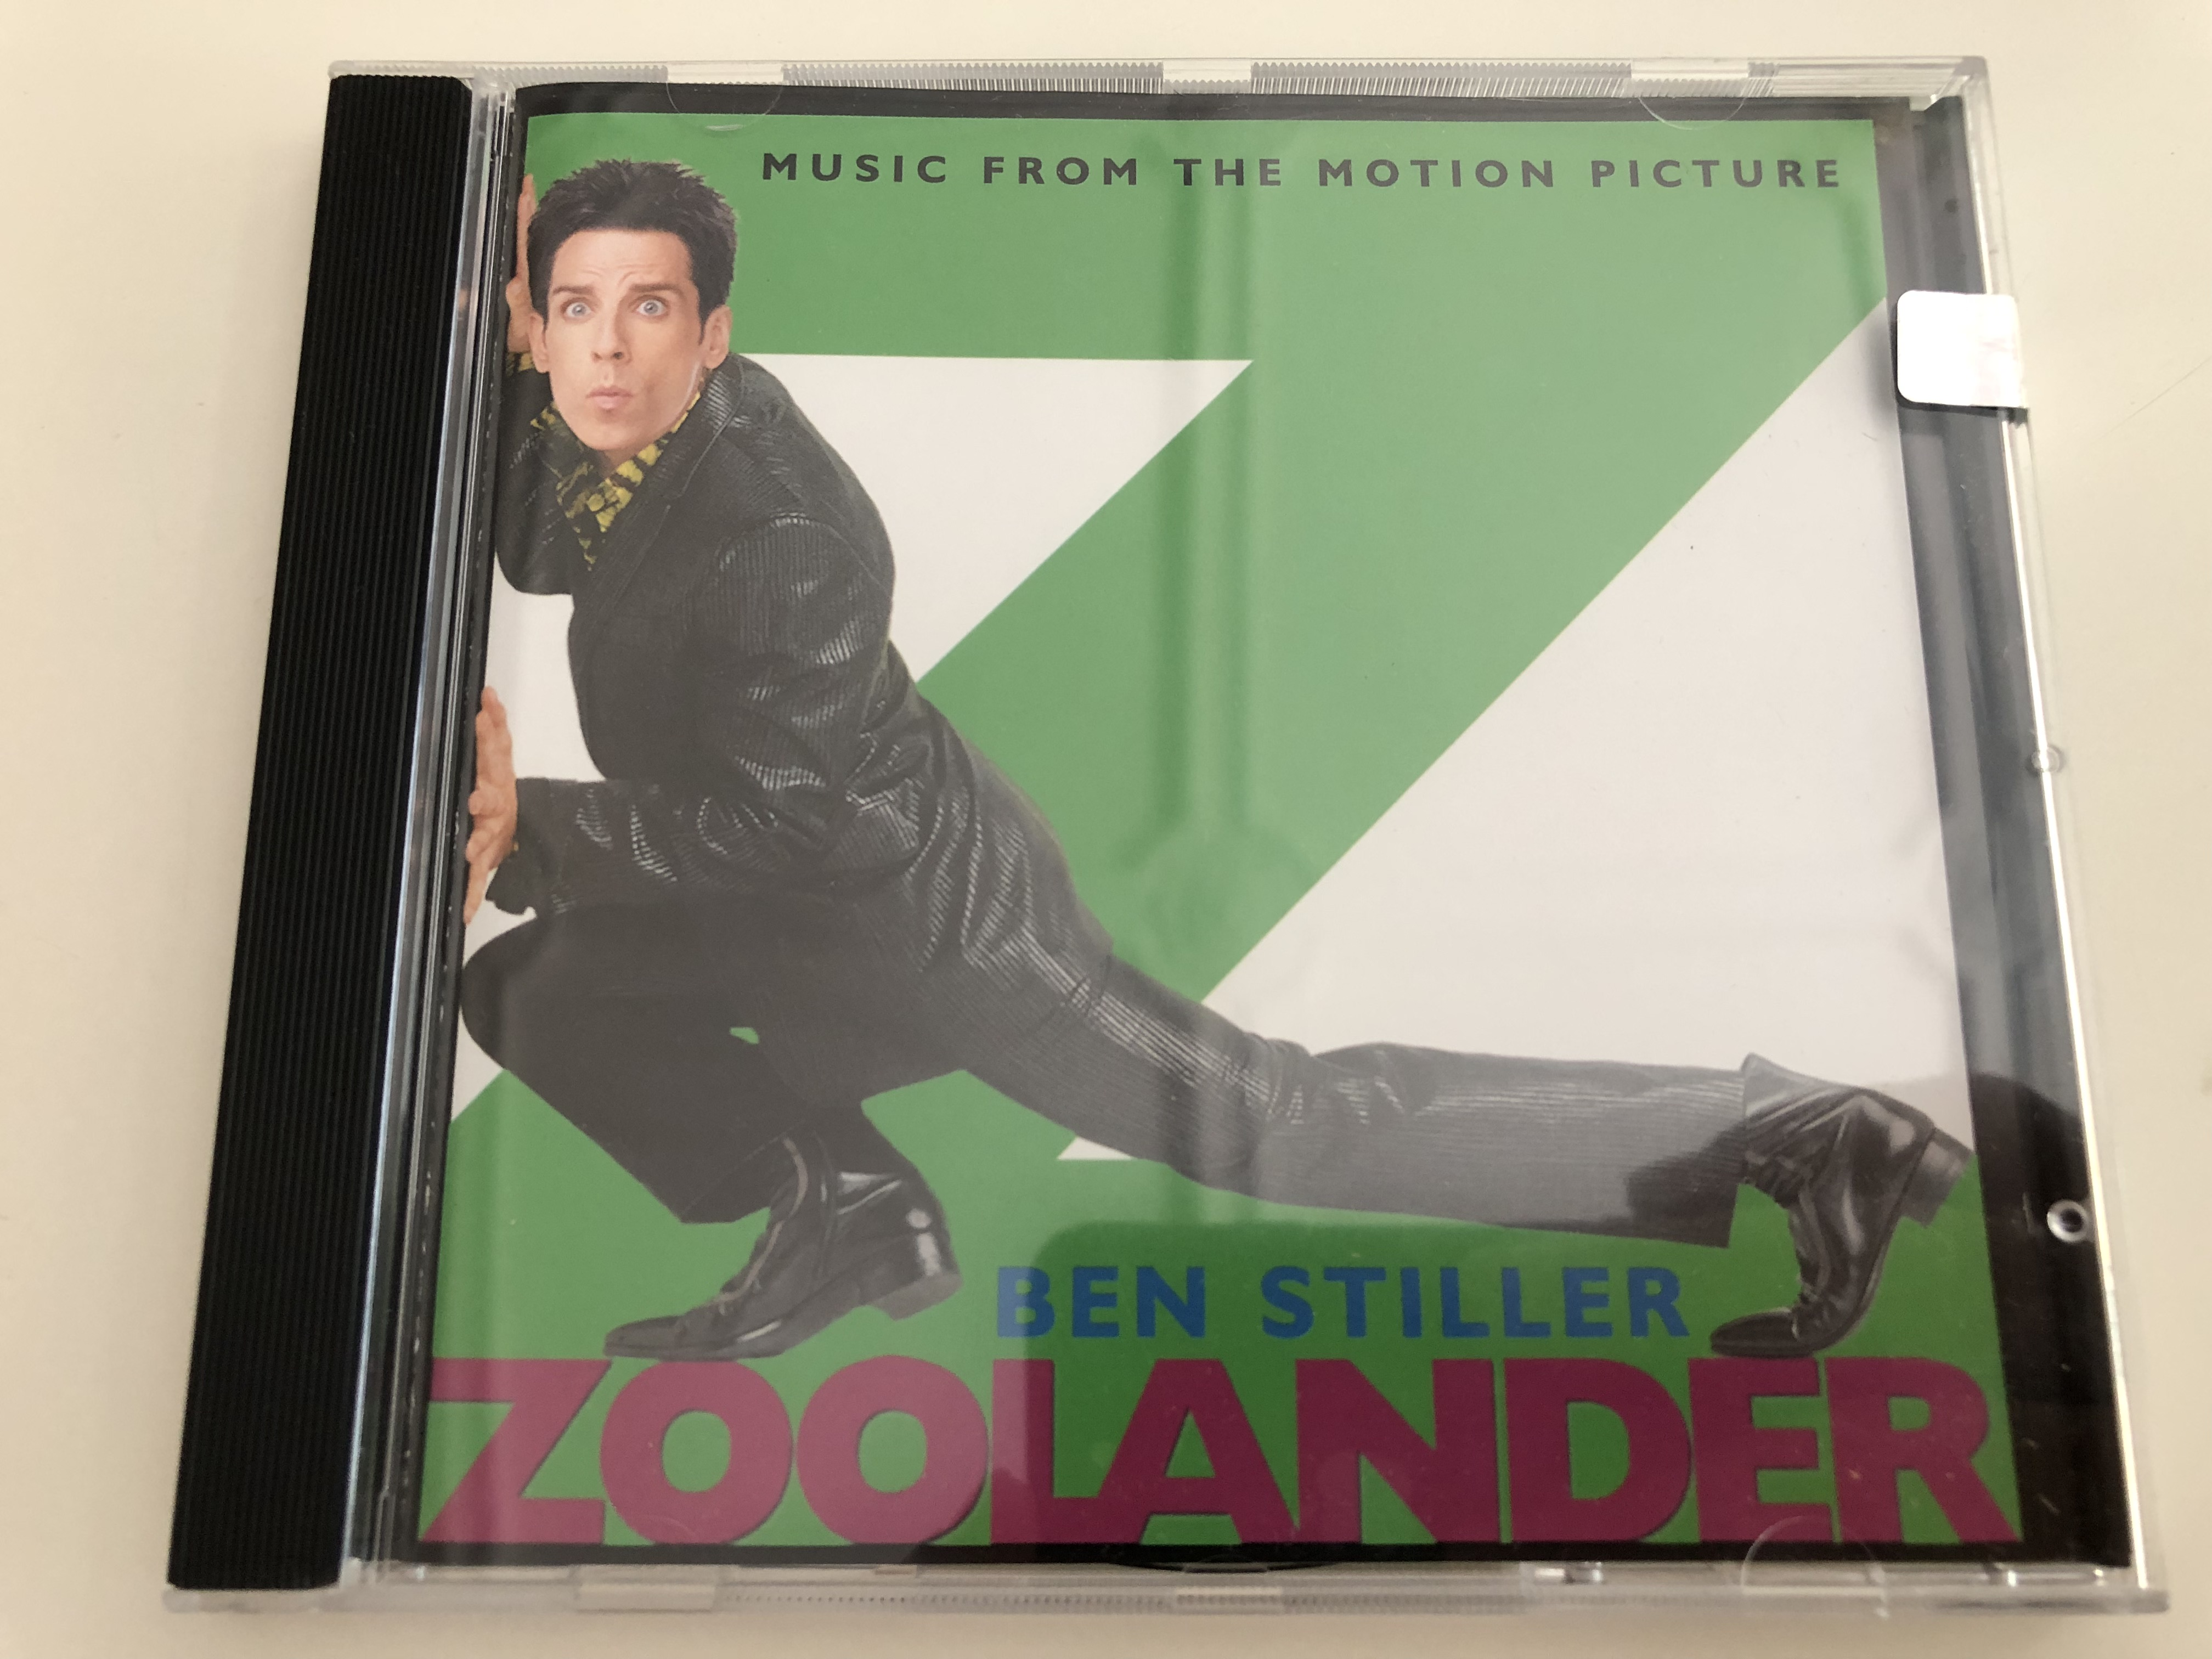 ben-stiller-zoolander-music-from-the-motion-picture-audio-cd-2001-1-.jpg